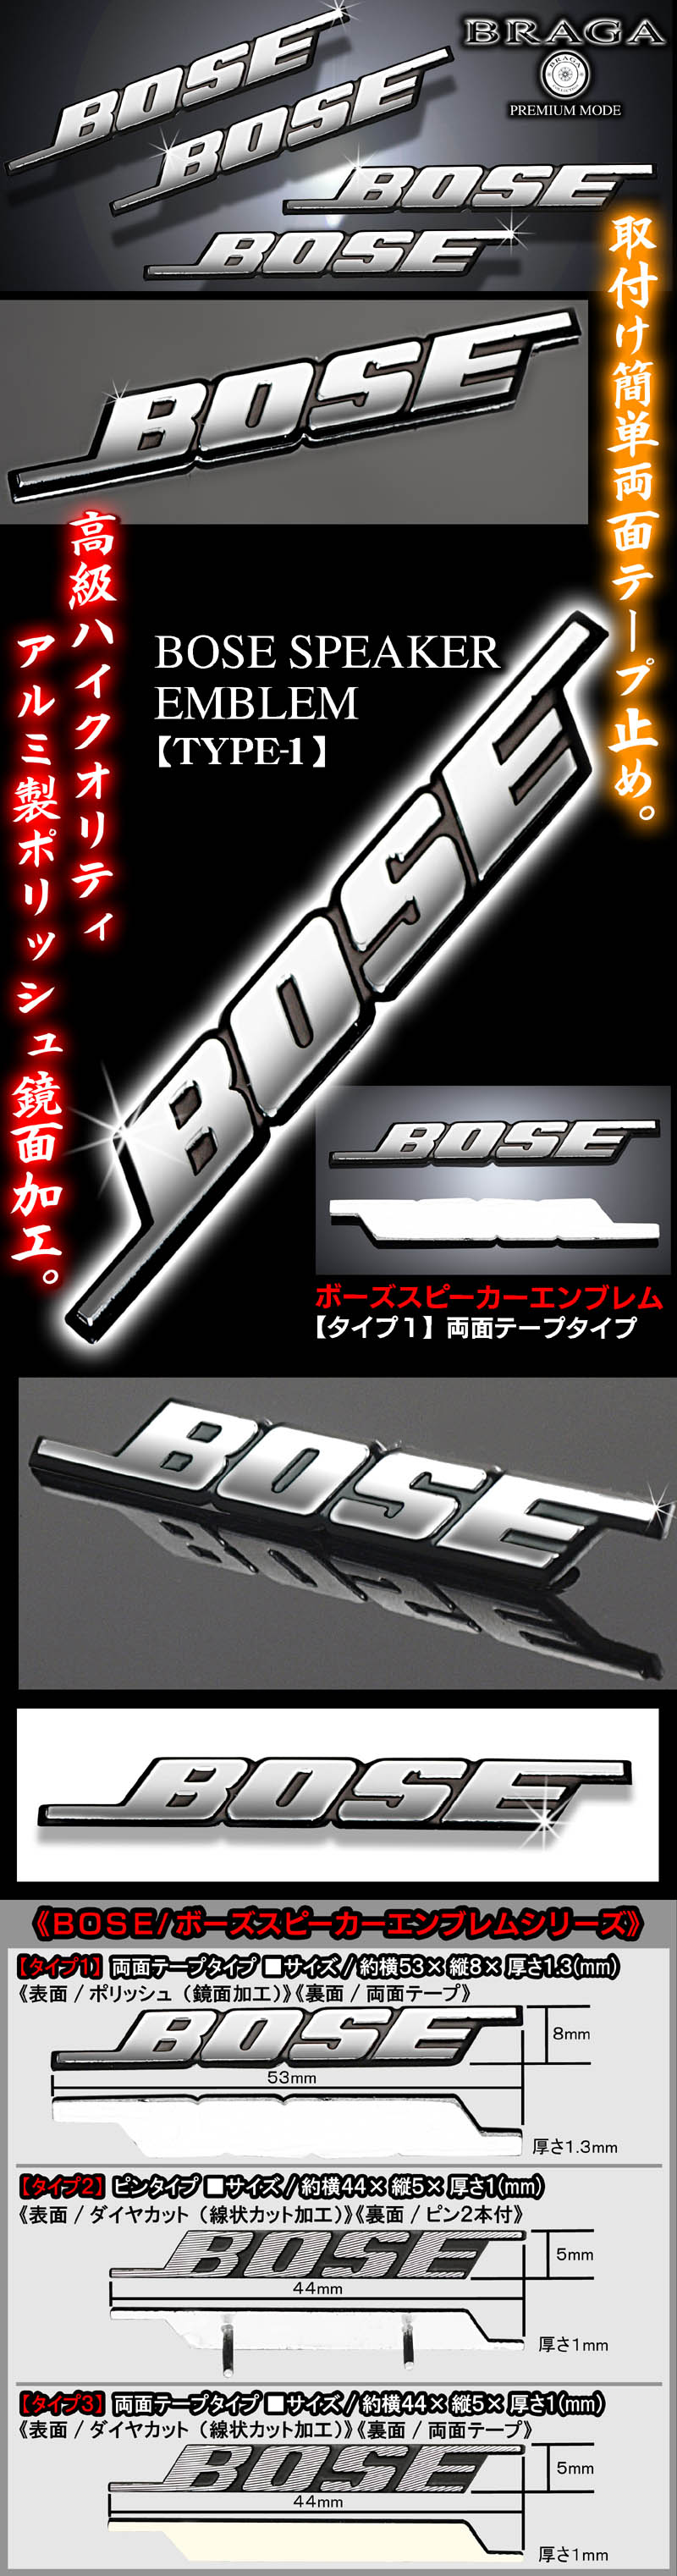 《BOSE》ボーズスピーカーエンブレム《タイプ1》4個セット【両面テープタイプ】アルミ製ポリッシュ鏡面仕上/ブラガ